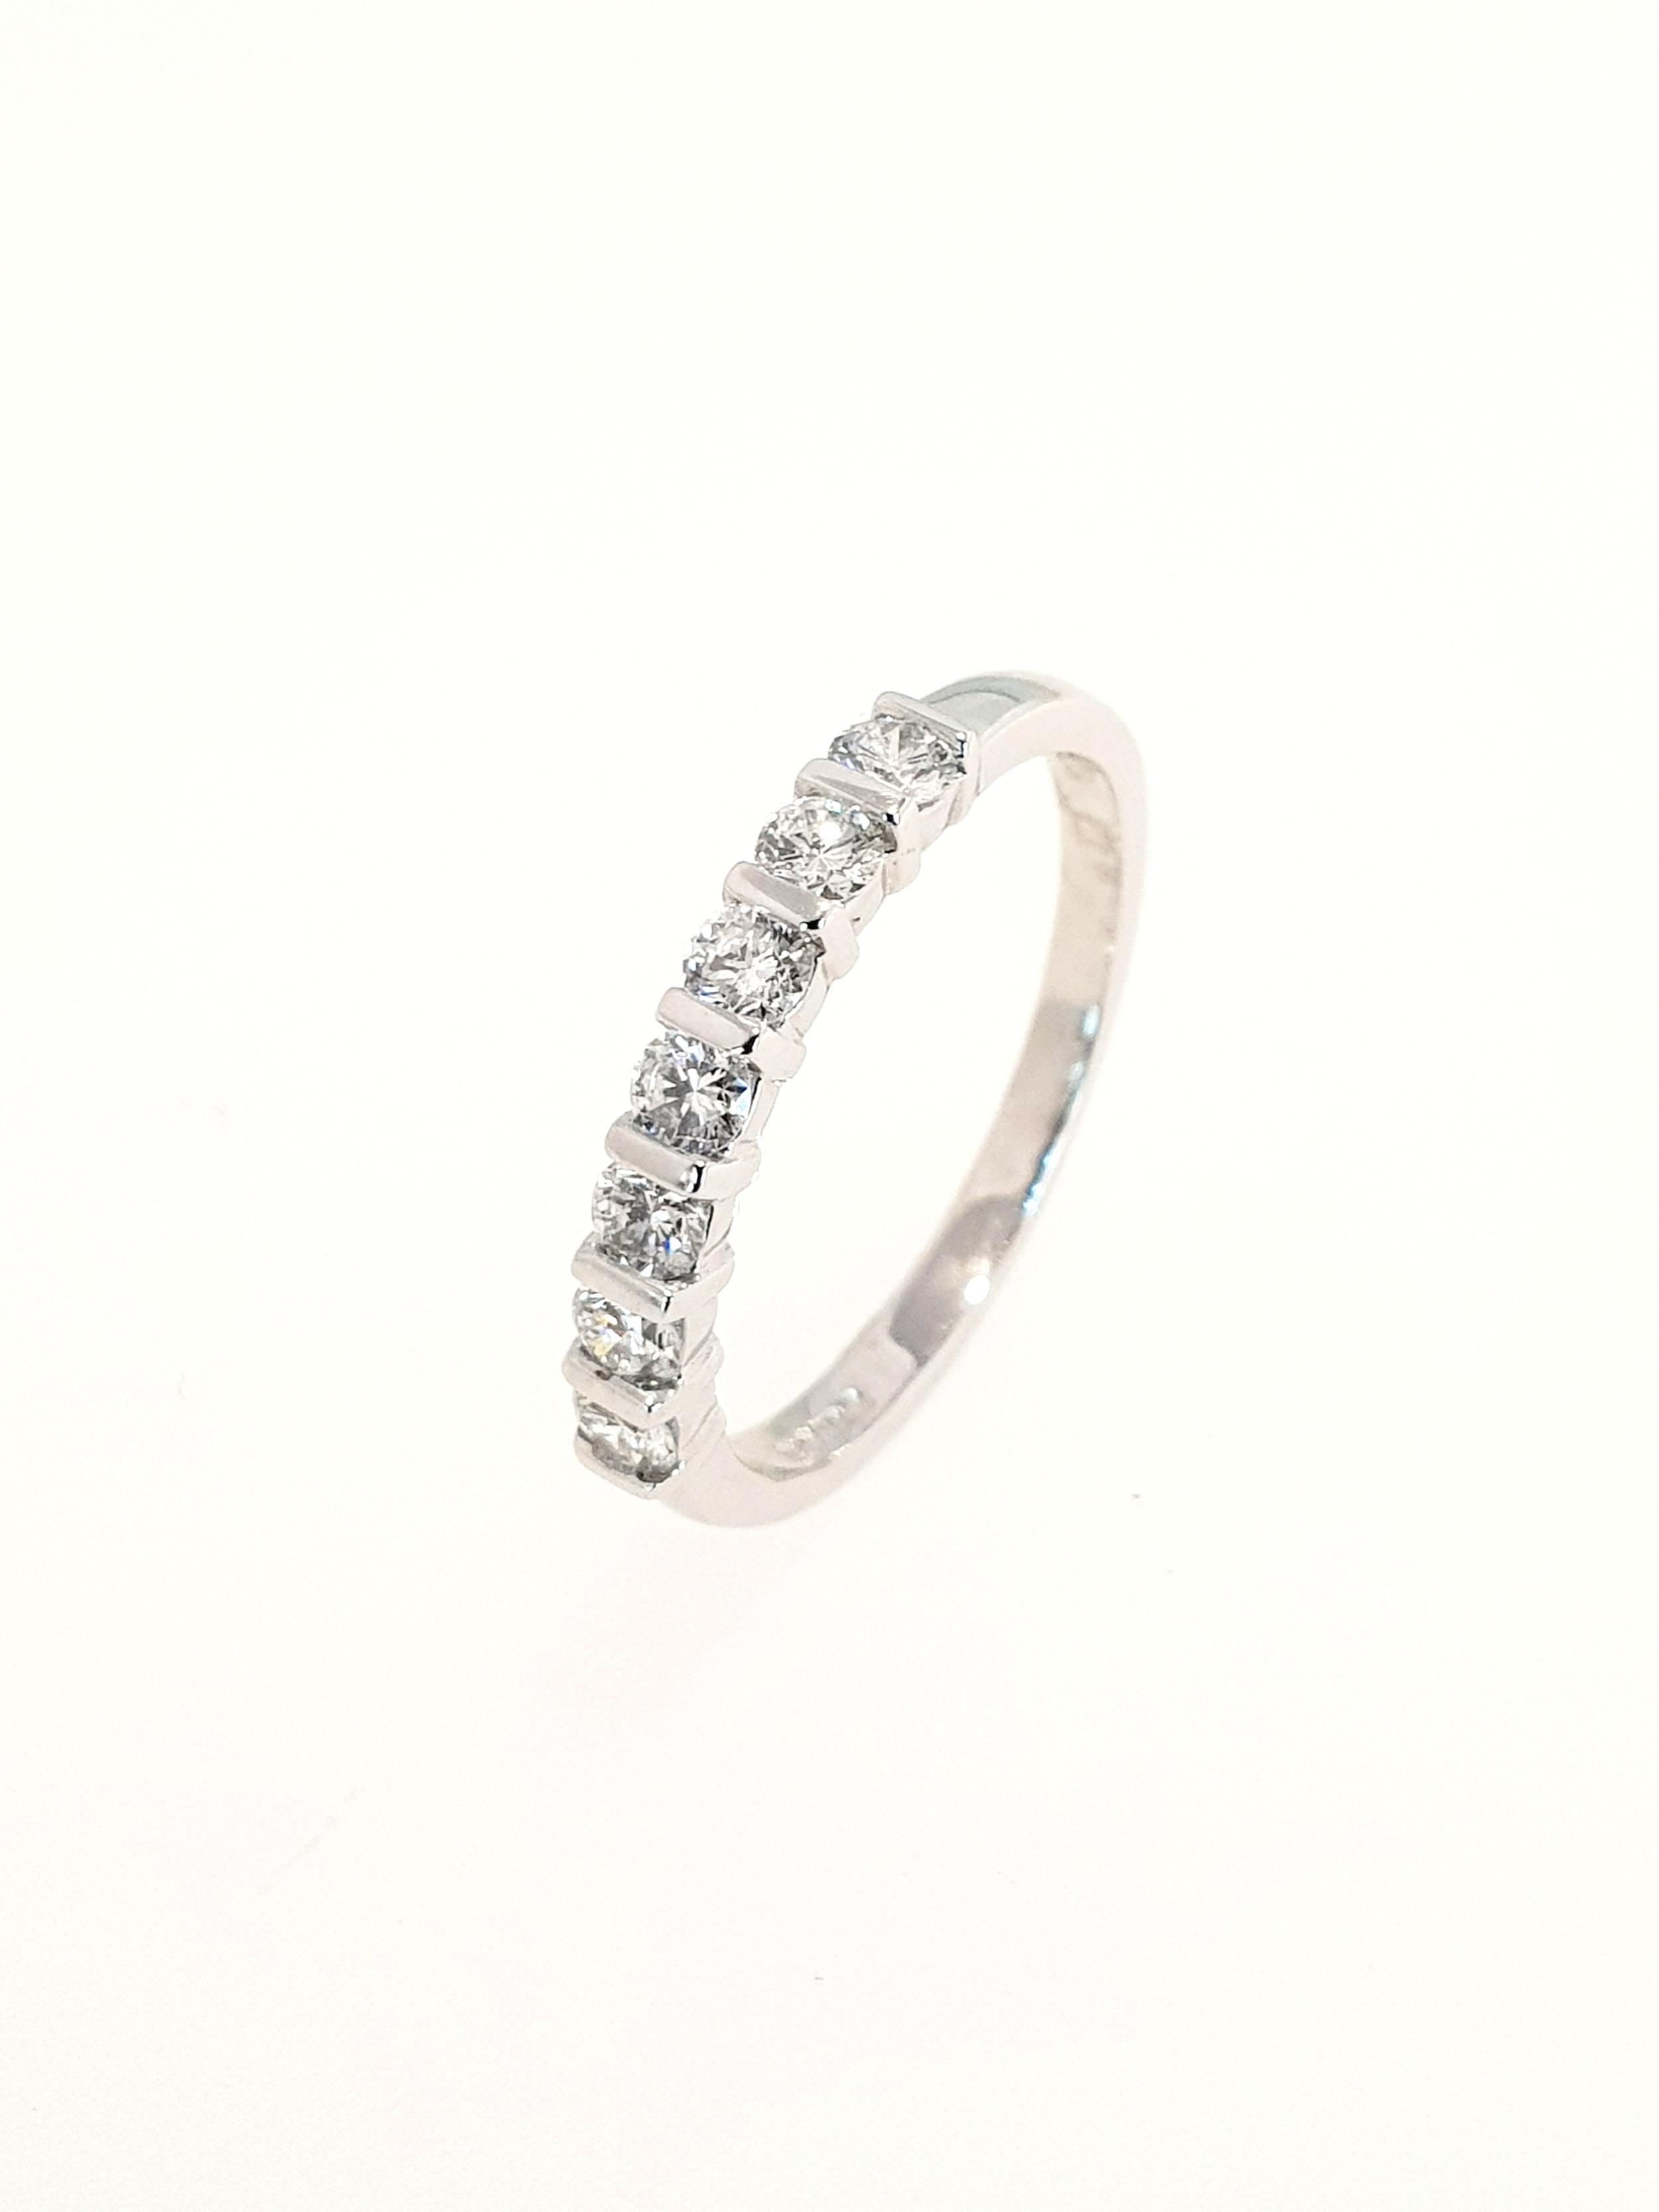 7 Stone Eternity Ring, Bar Set, 18ct White Gold  .49 Total Carat Weight  Stock Code: N8604  £1450